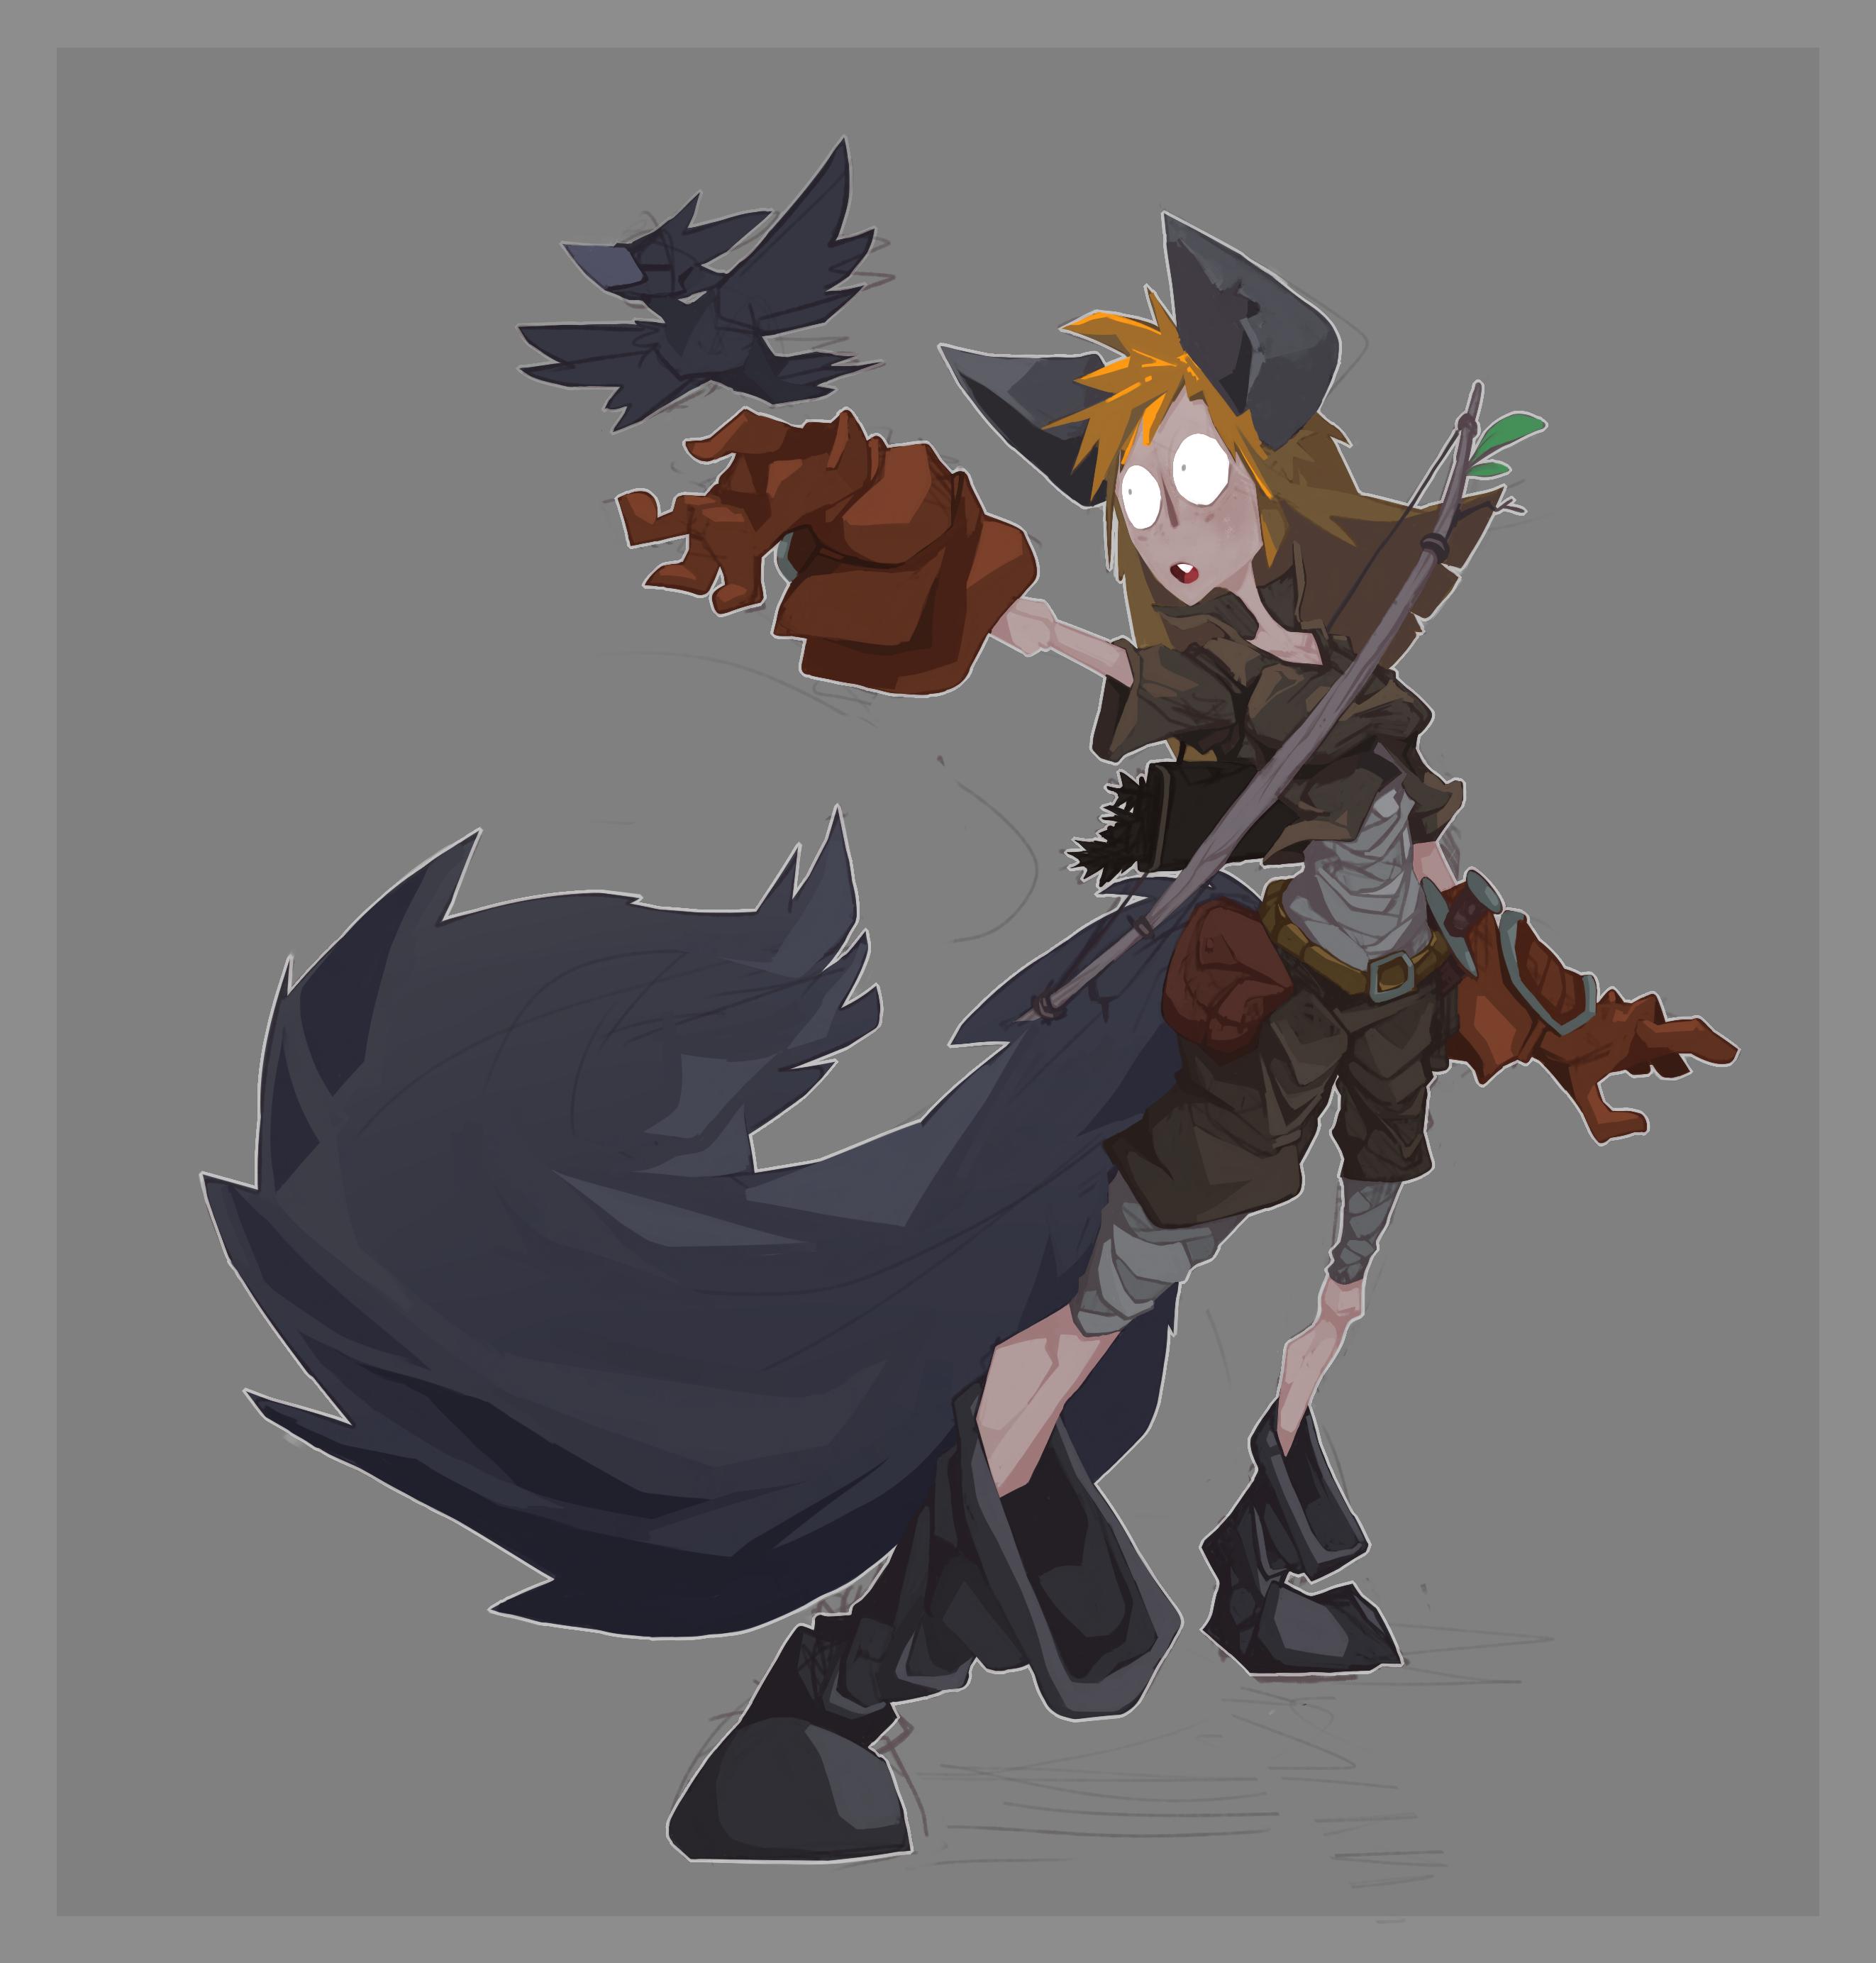 Ameli, the Werewolf!